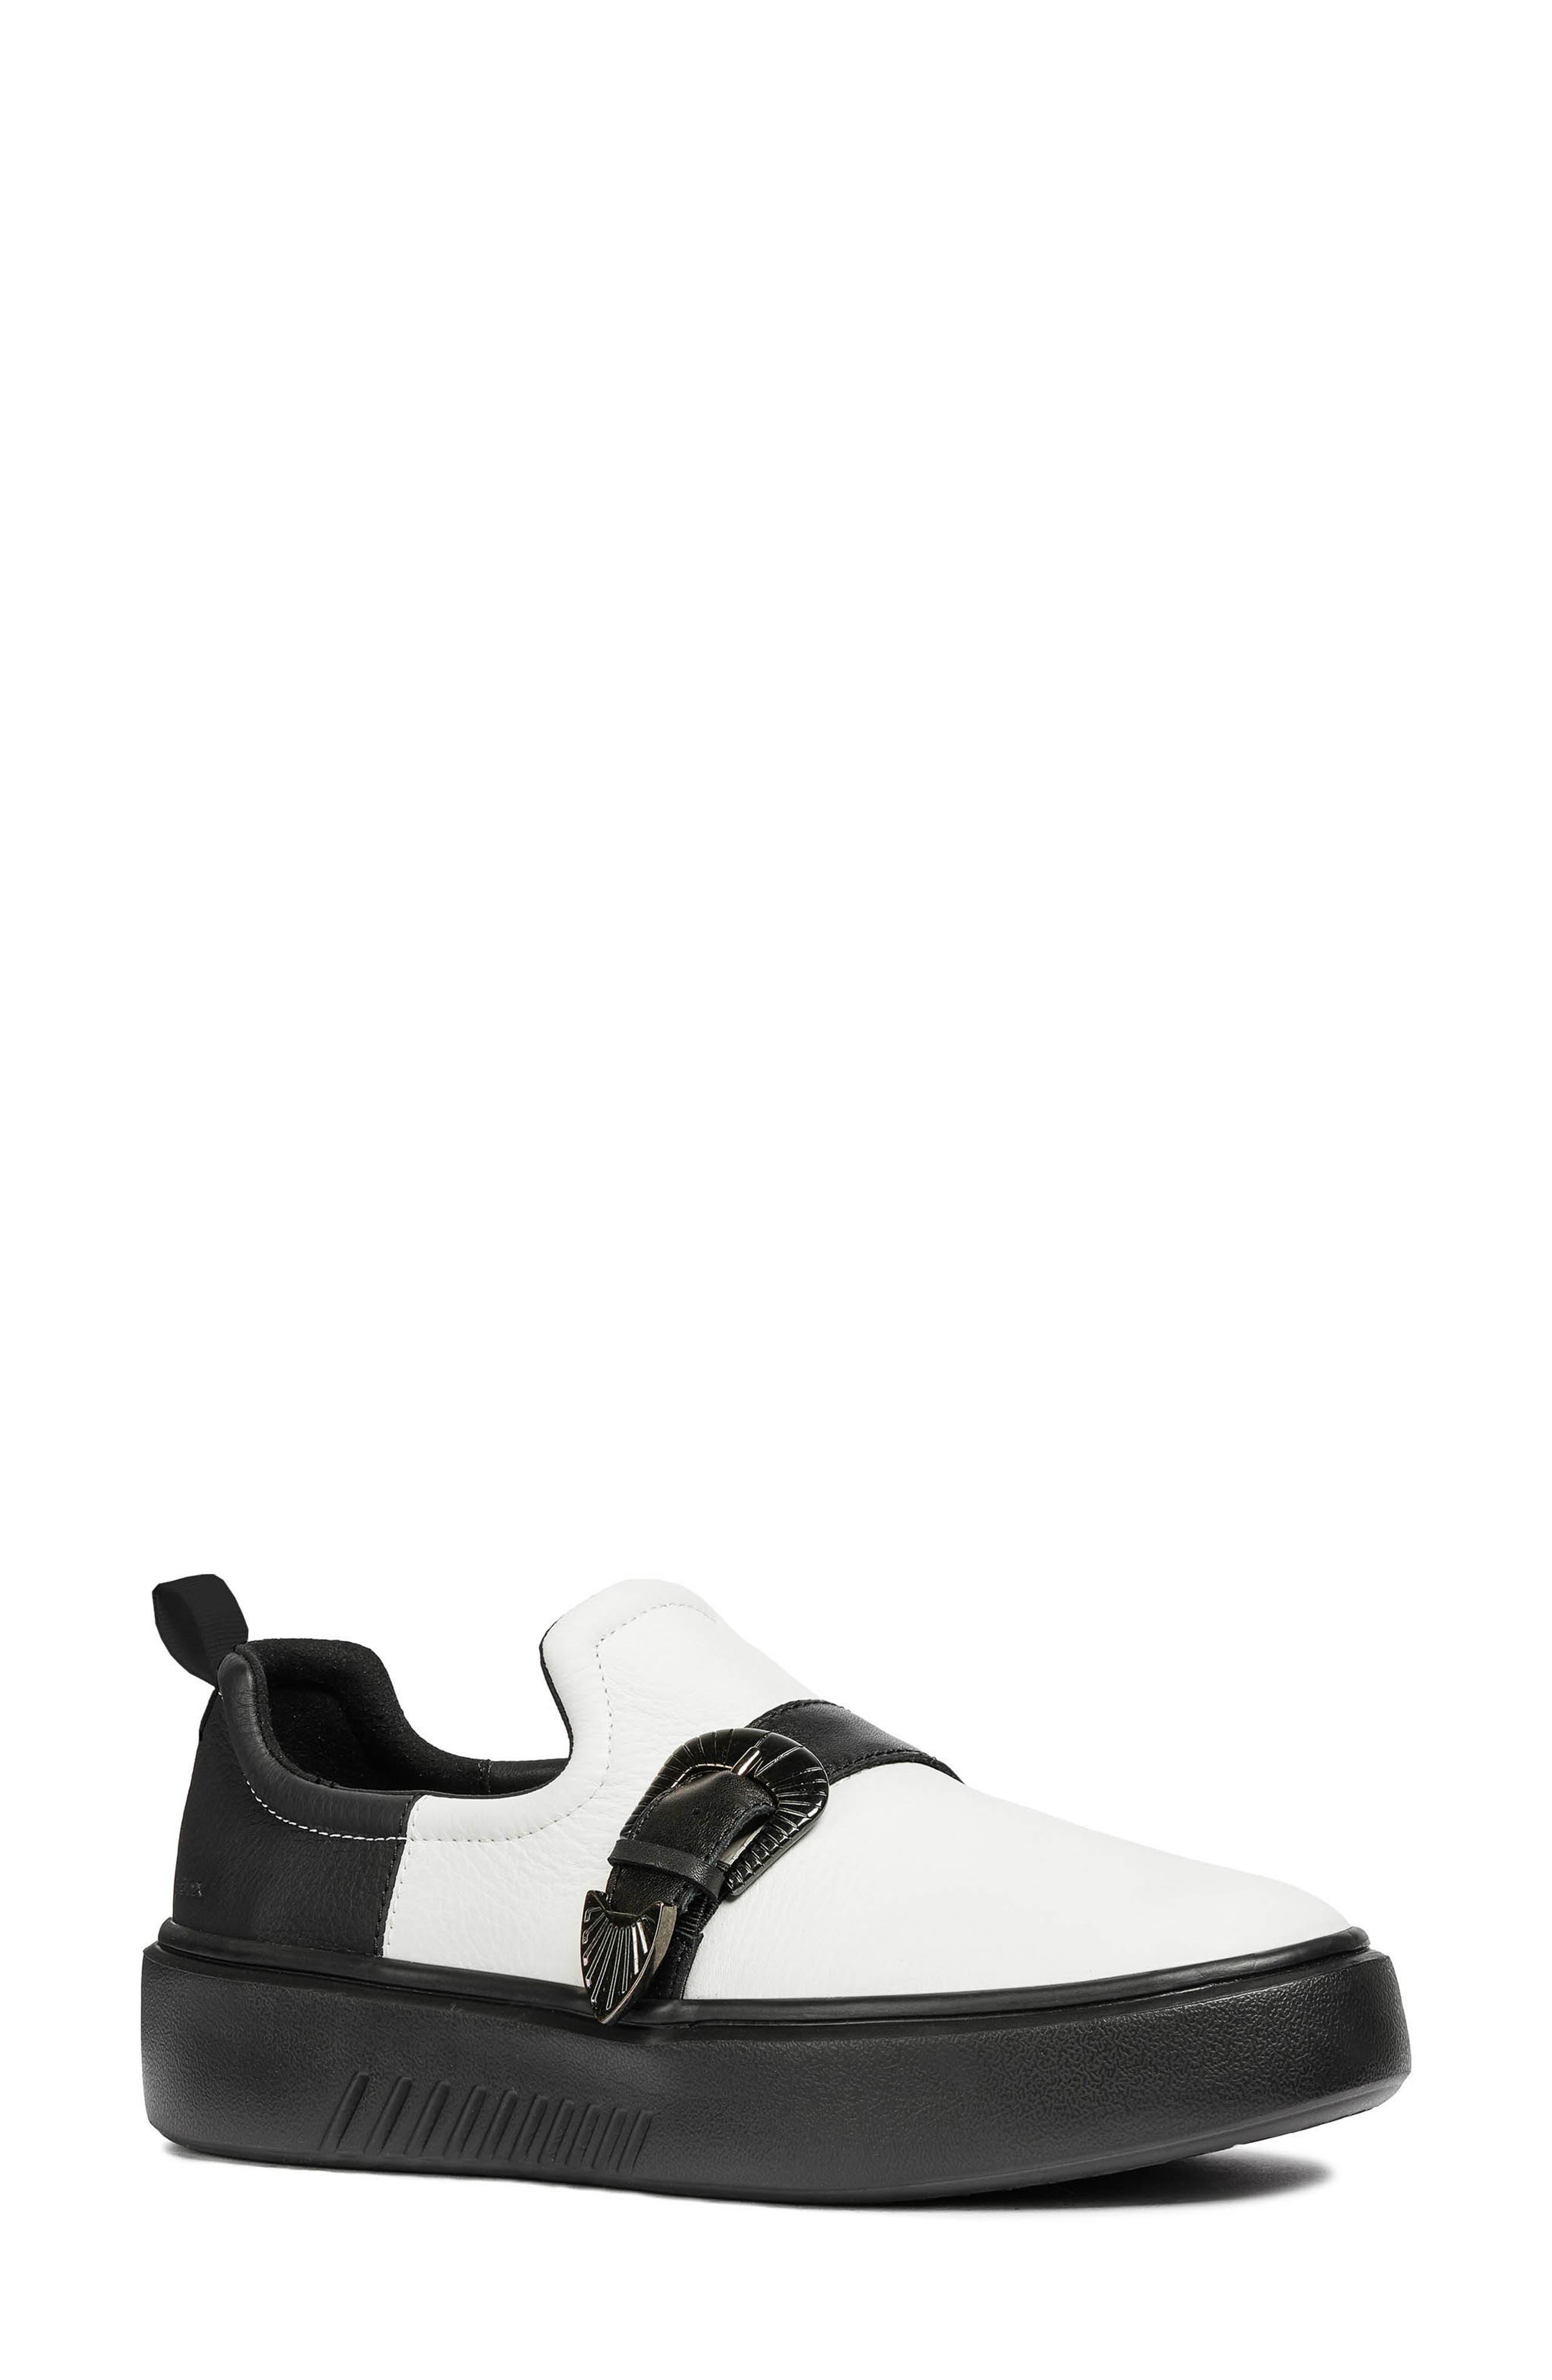 Nhenbus Platform Sneaker,                         Main,                         color, WHITE/ BLACK LEATHER